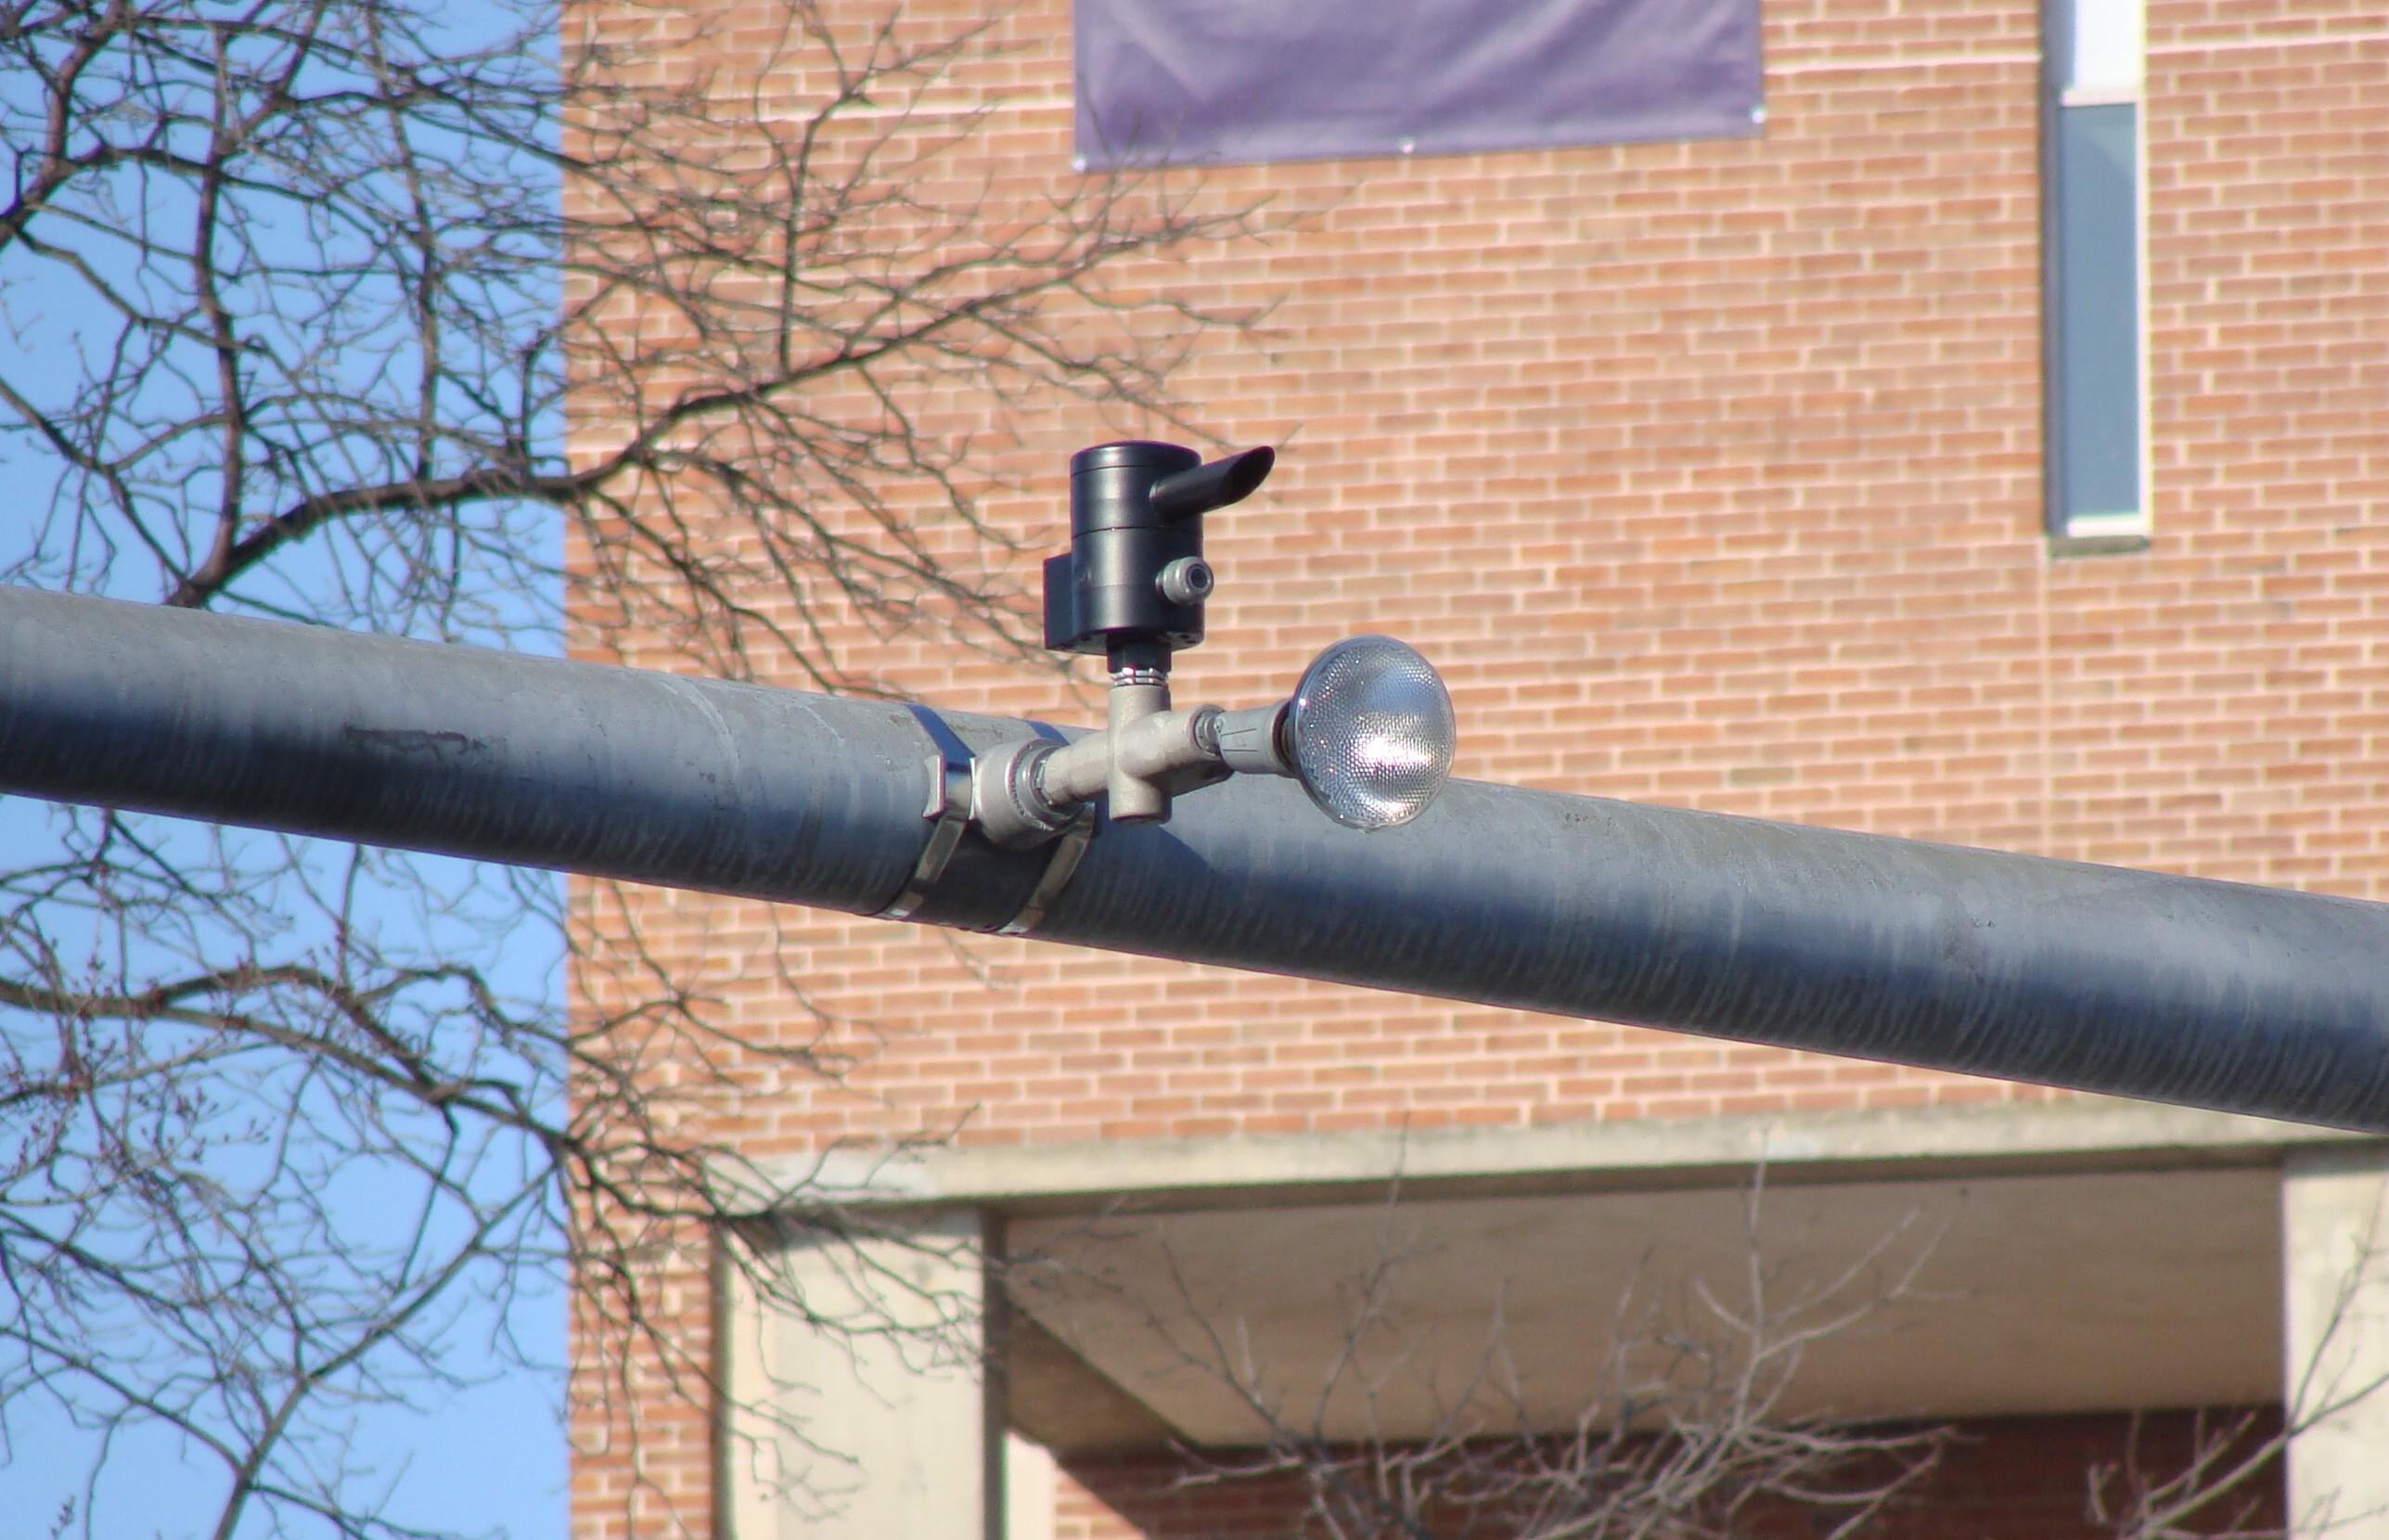 Sensor Triggers Red Light When Speeding Poi Factory